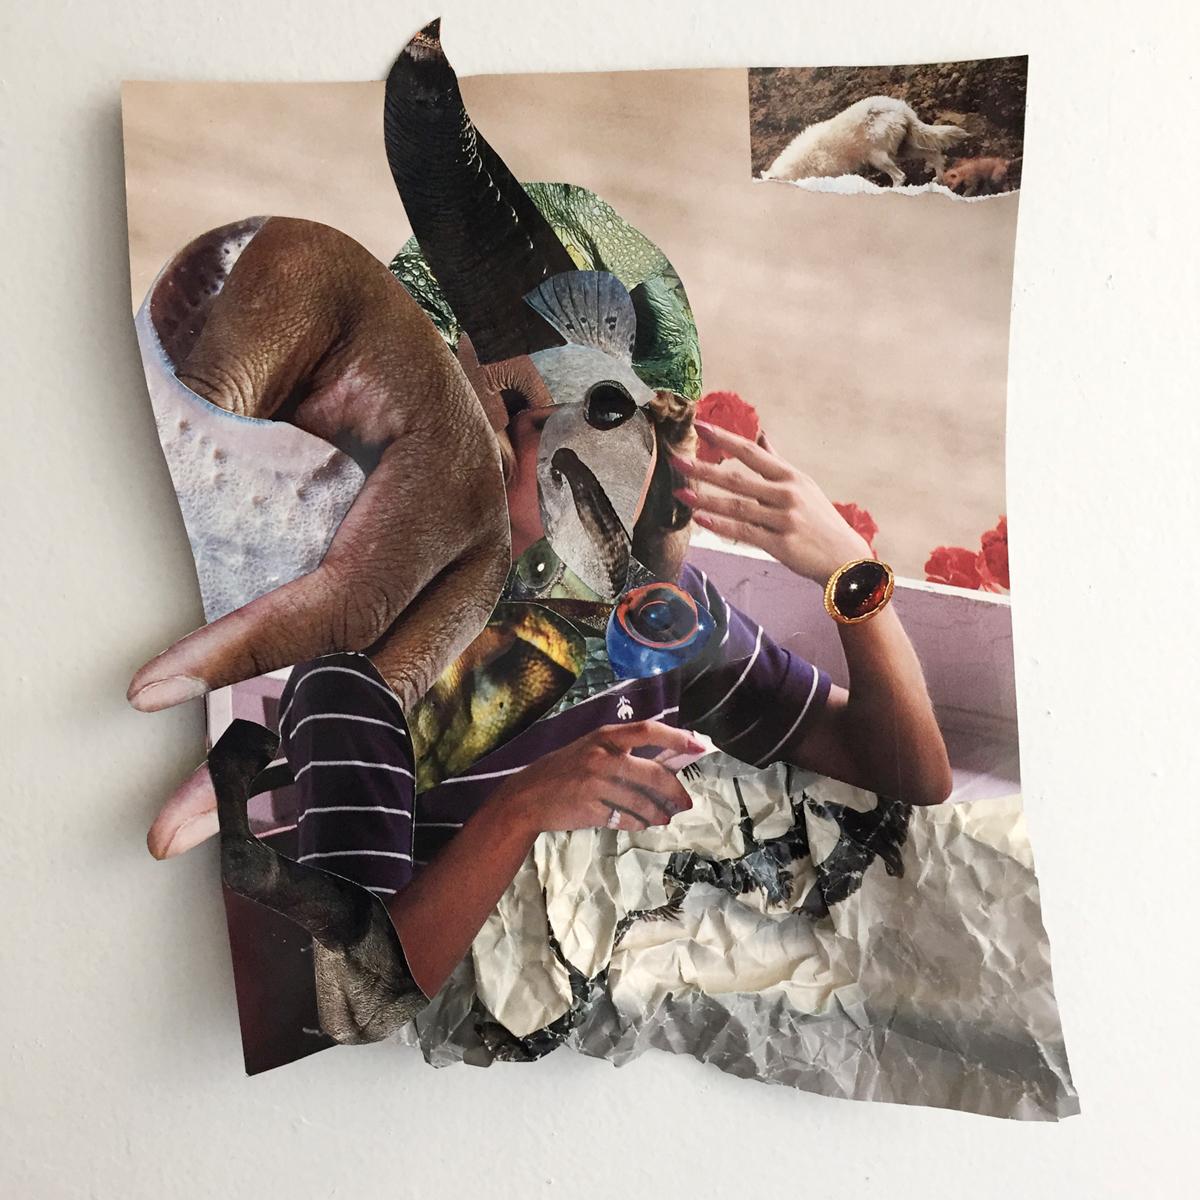 Suné Woods,Mutter,2016 年。9 x 12 英寸。混合媒体拼贴。